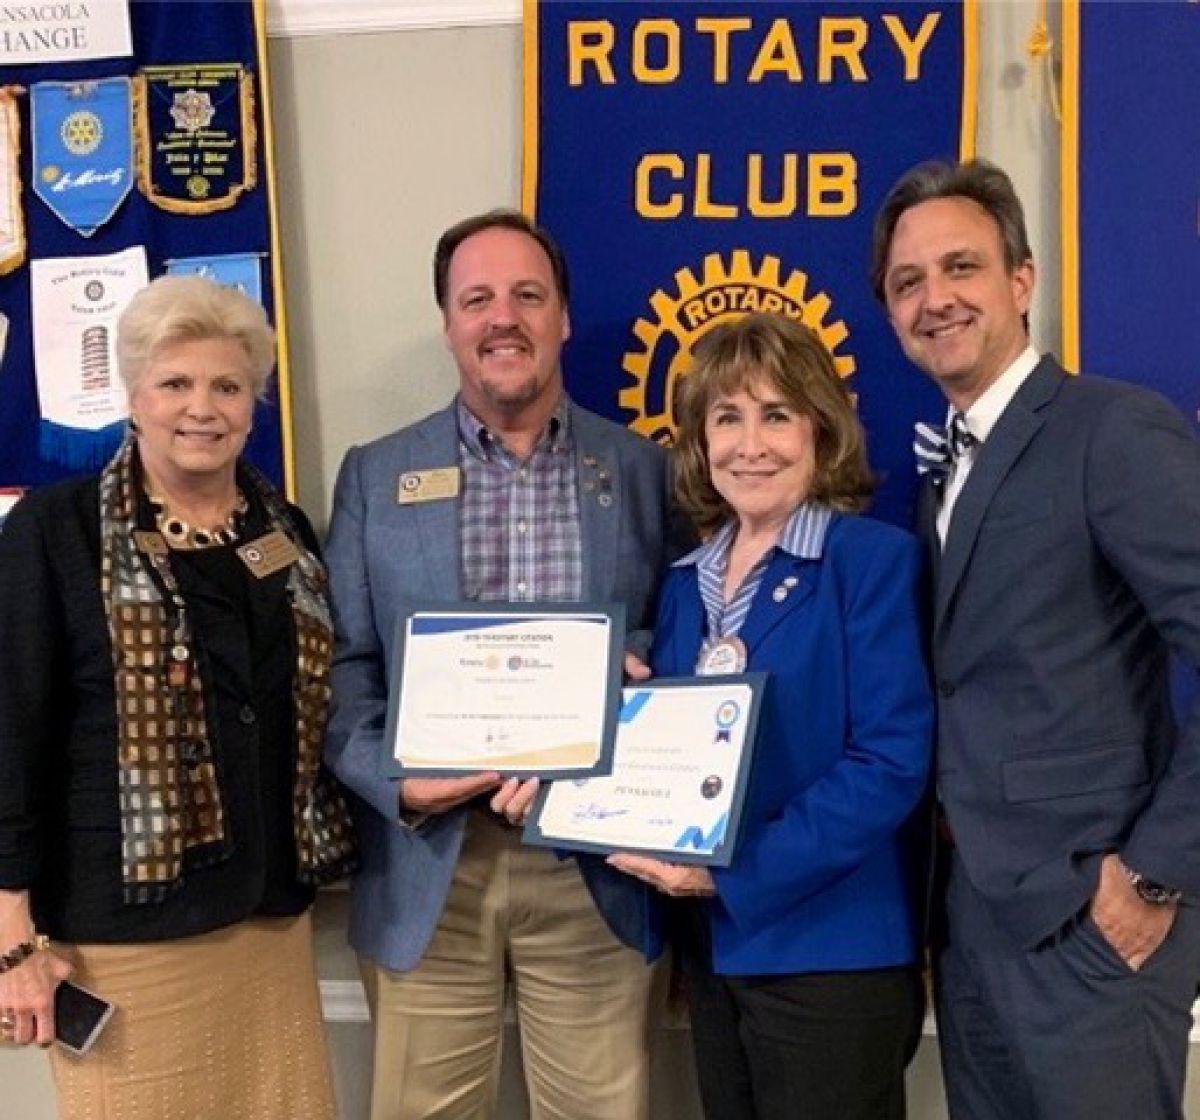 Rotary Club members receiving an award